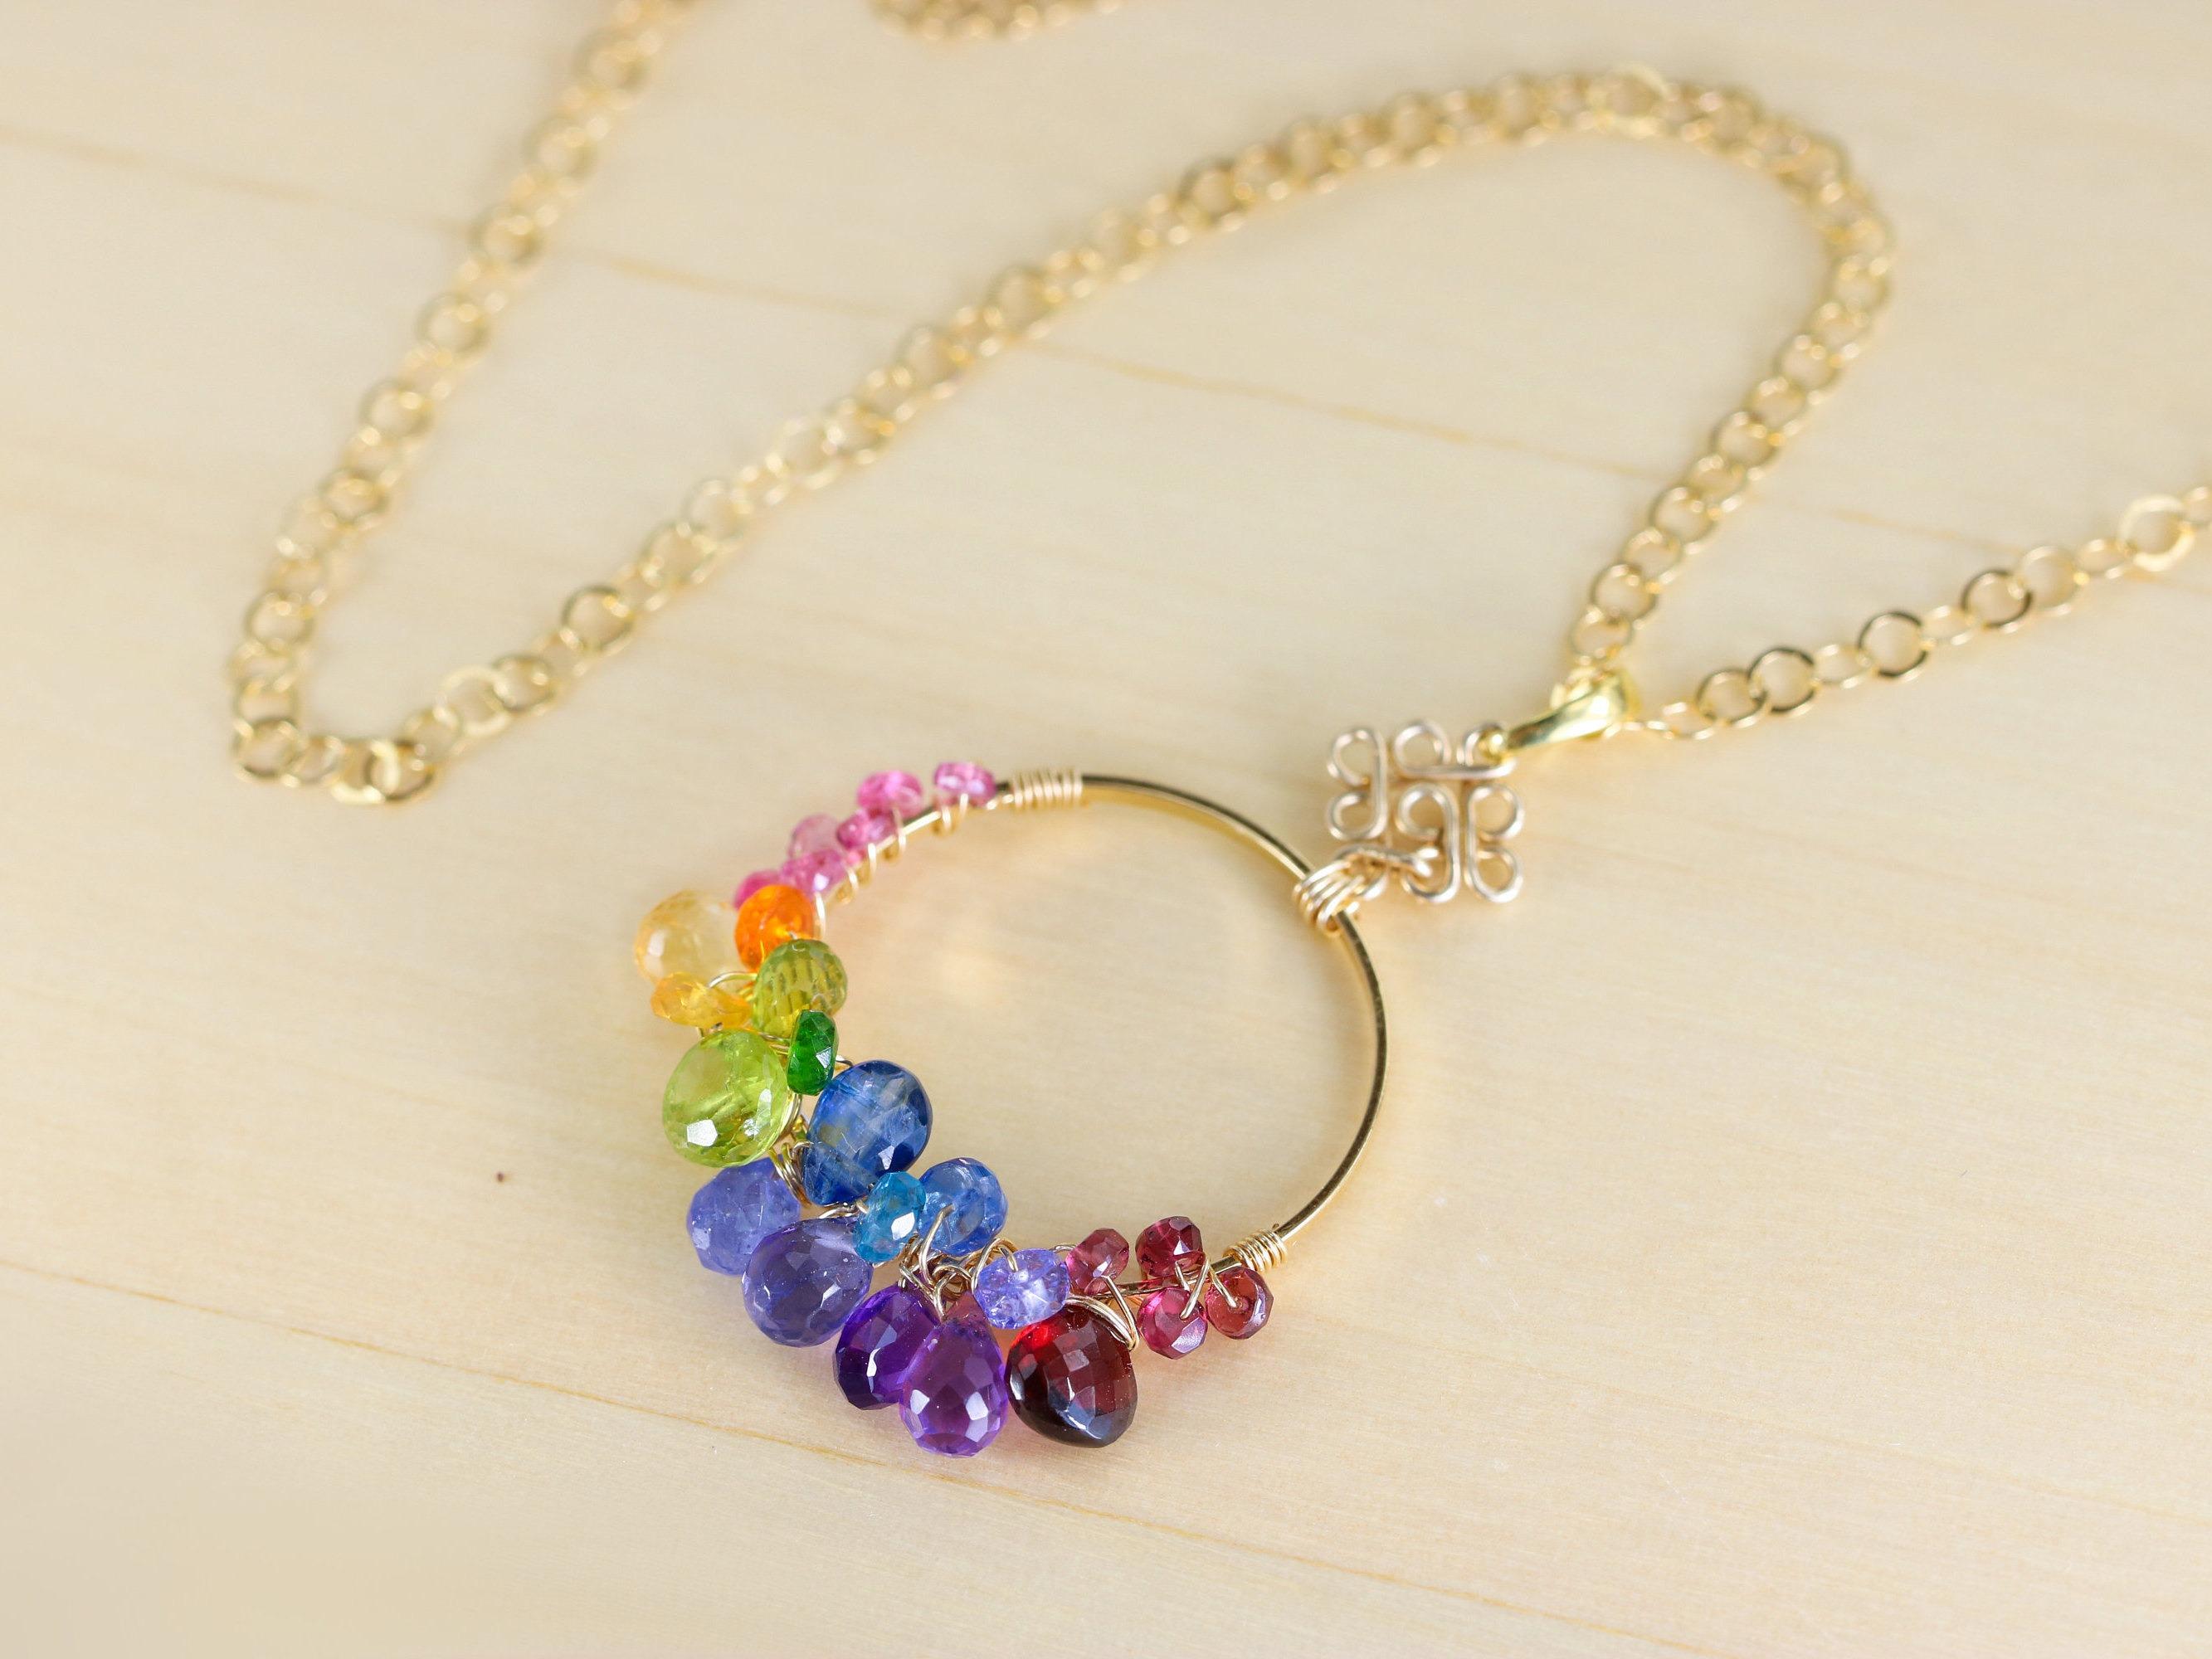 Multi gemstone hoop pendant necklace in gold filled valltasy the felicity pendant multi gemstone hoop pendant necklace in gold filled aloadofball Choice Image